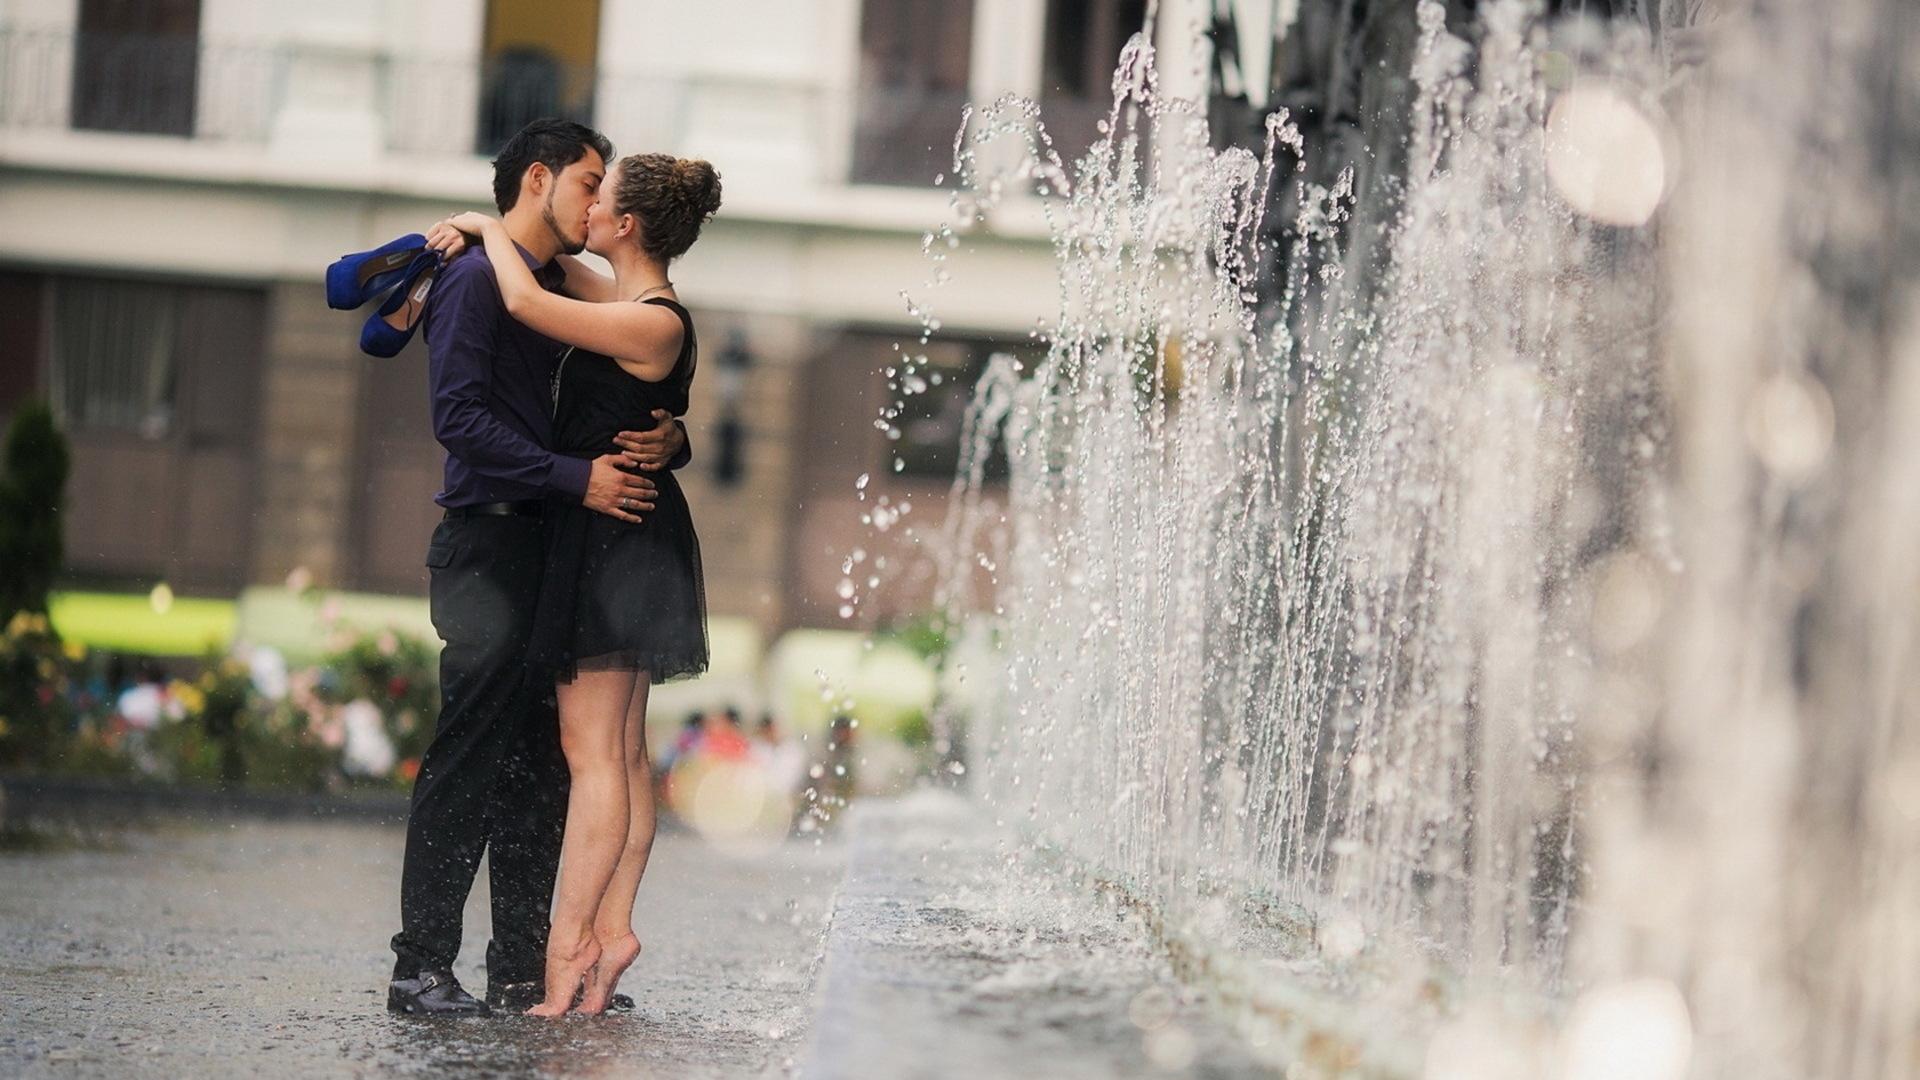 Download Wallpaper 1920x1080 Couple Date Romance Kiss Fountain